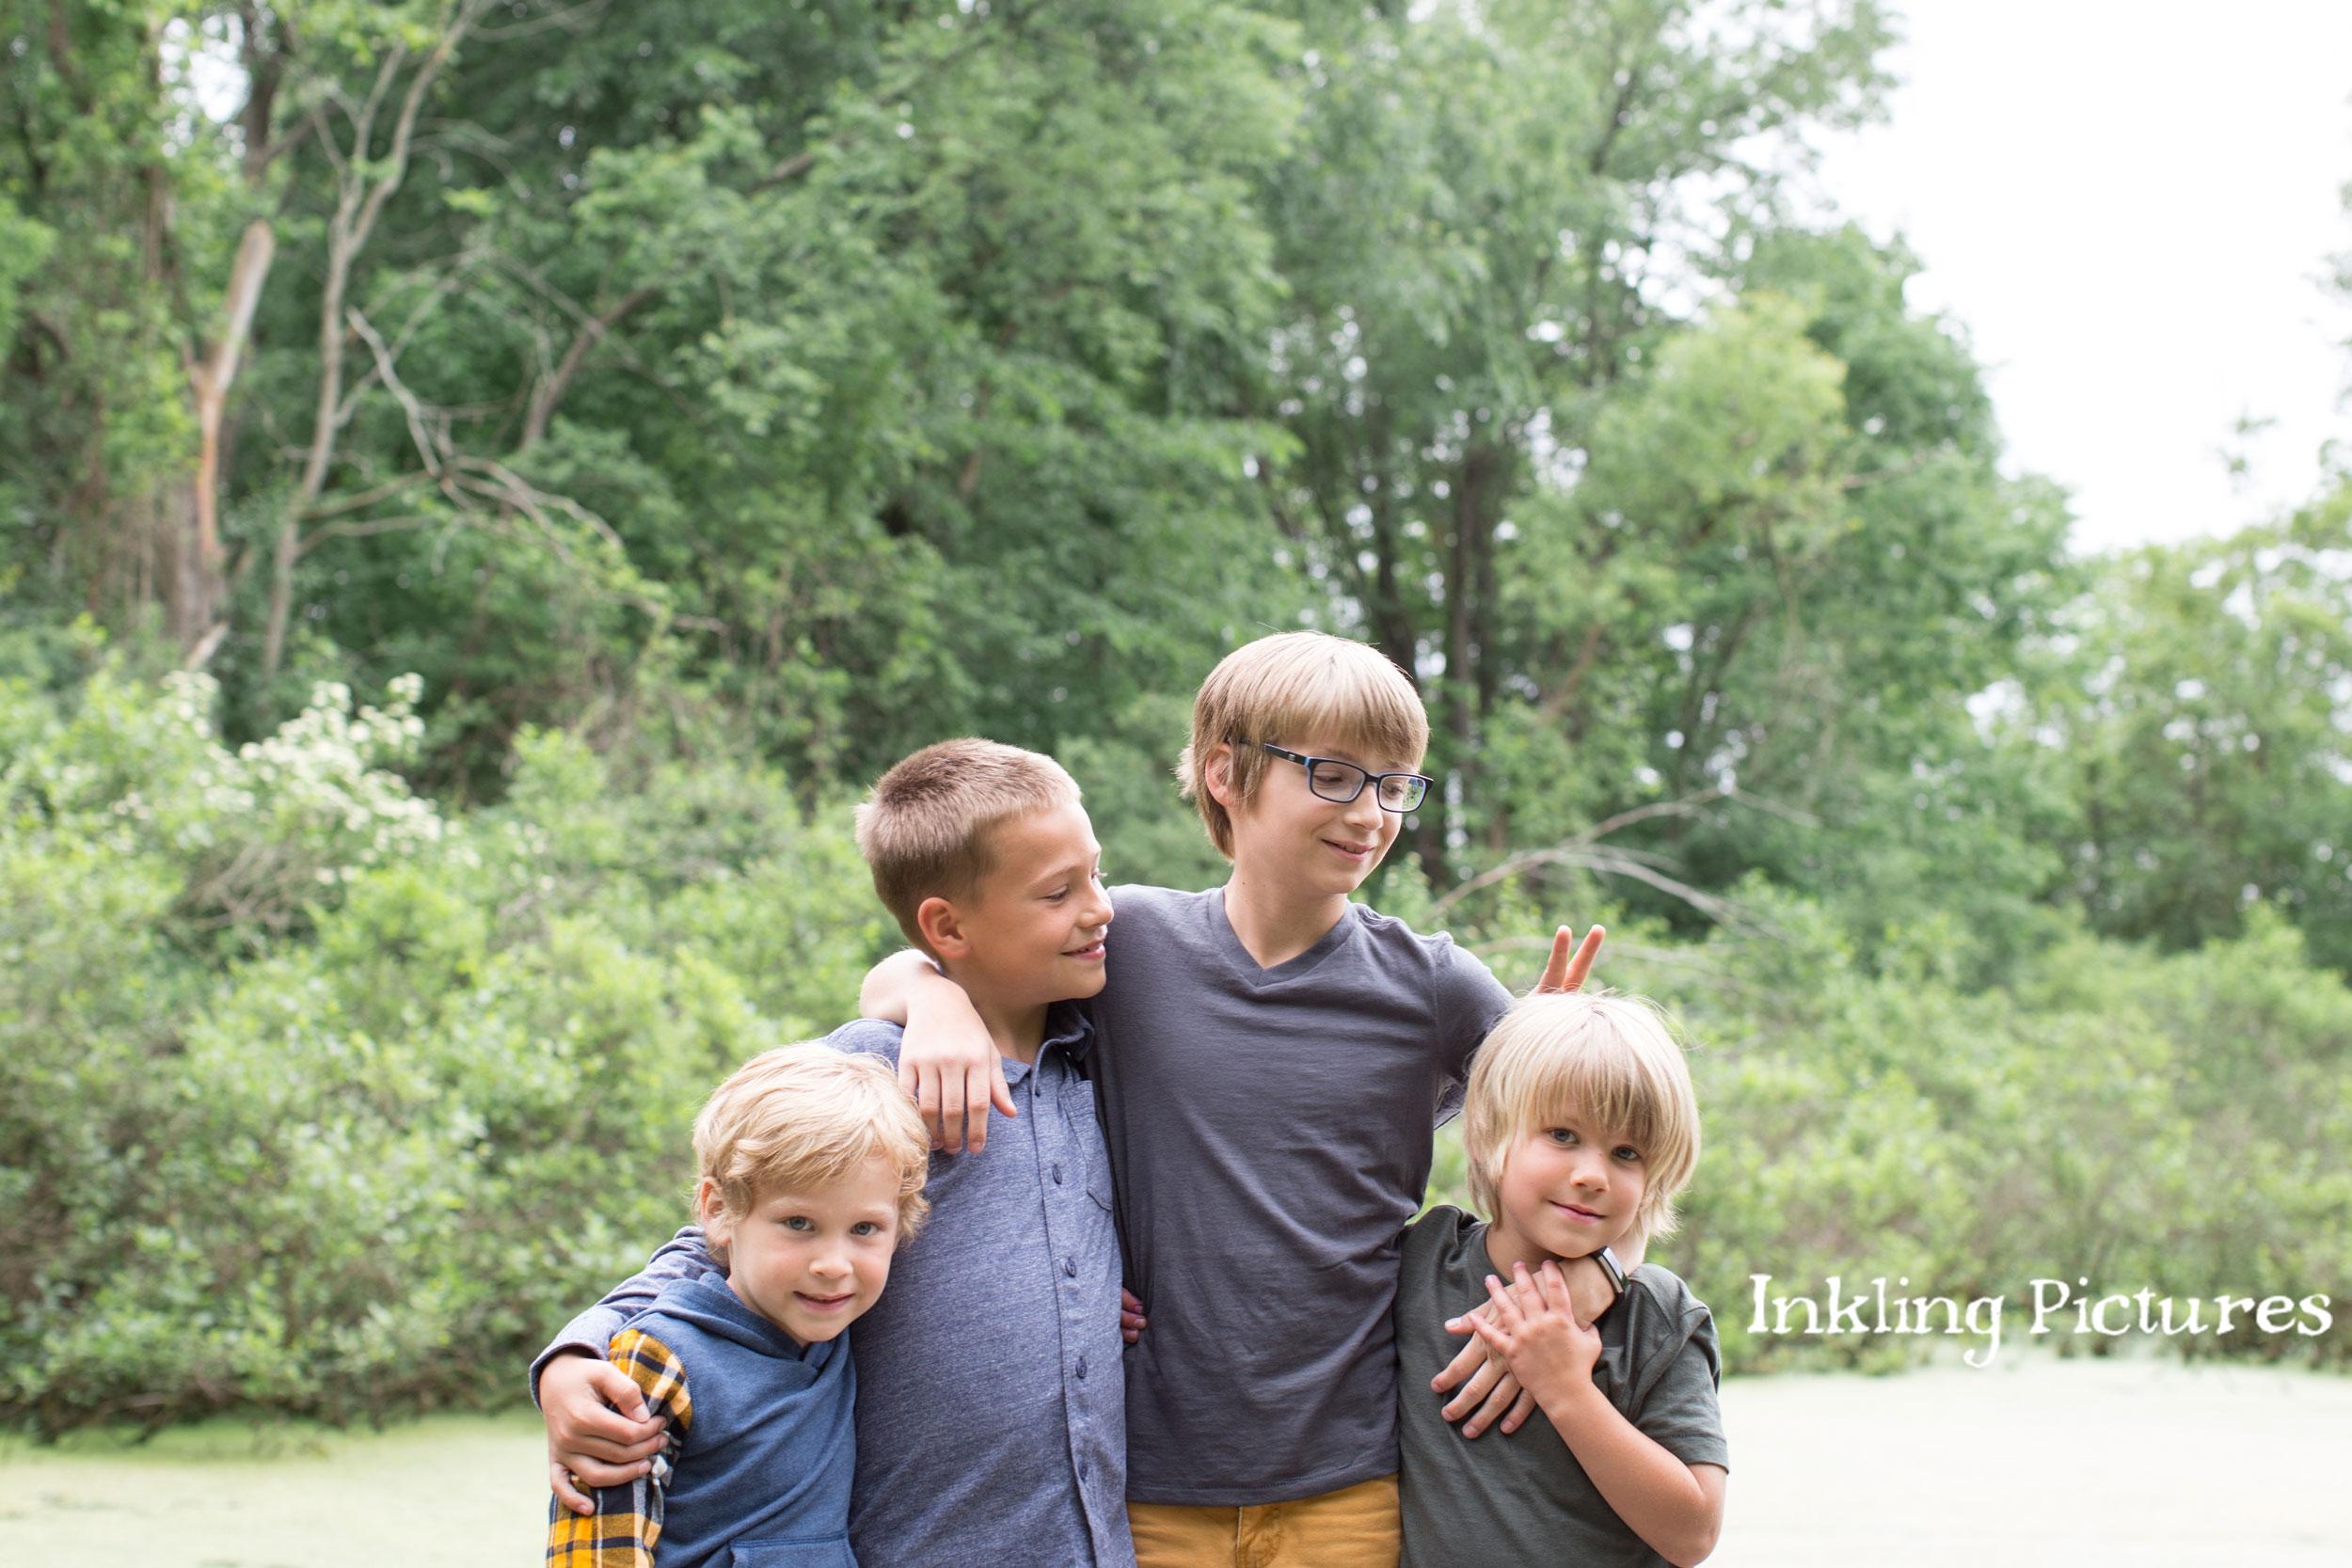 Koole-Family-Photo-2.jpg